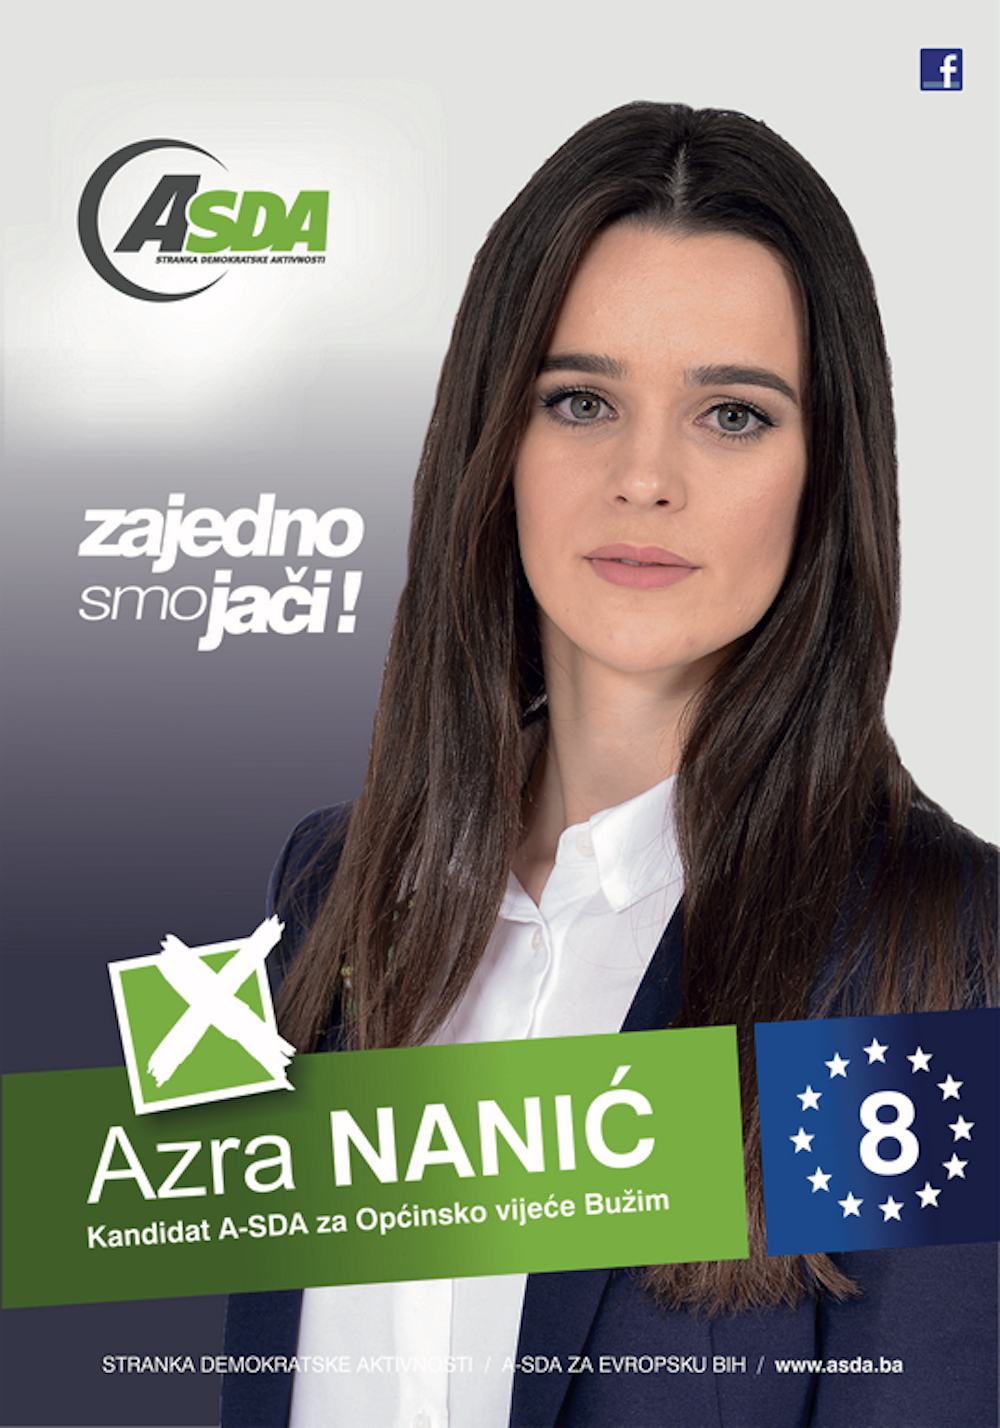 Azra Nanić